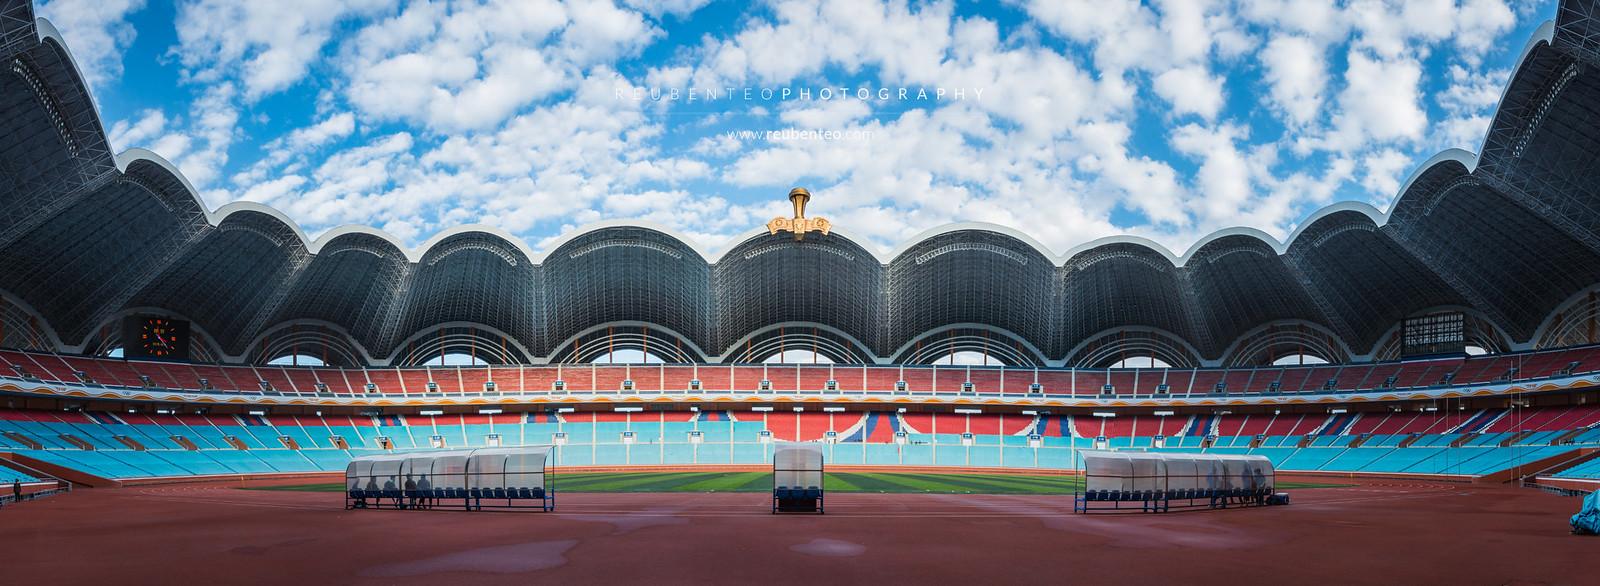 Mayday Stadium, Pyongyang